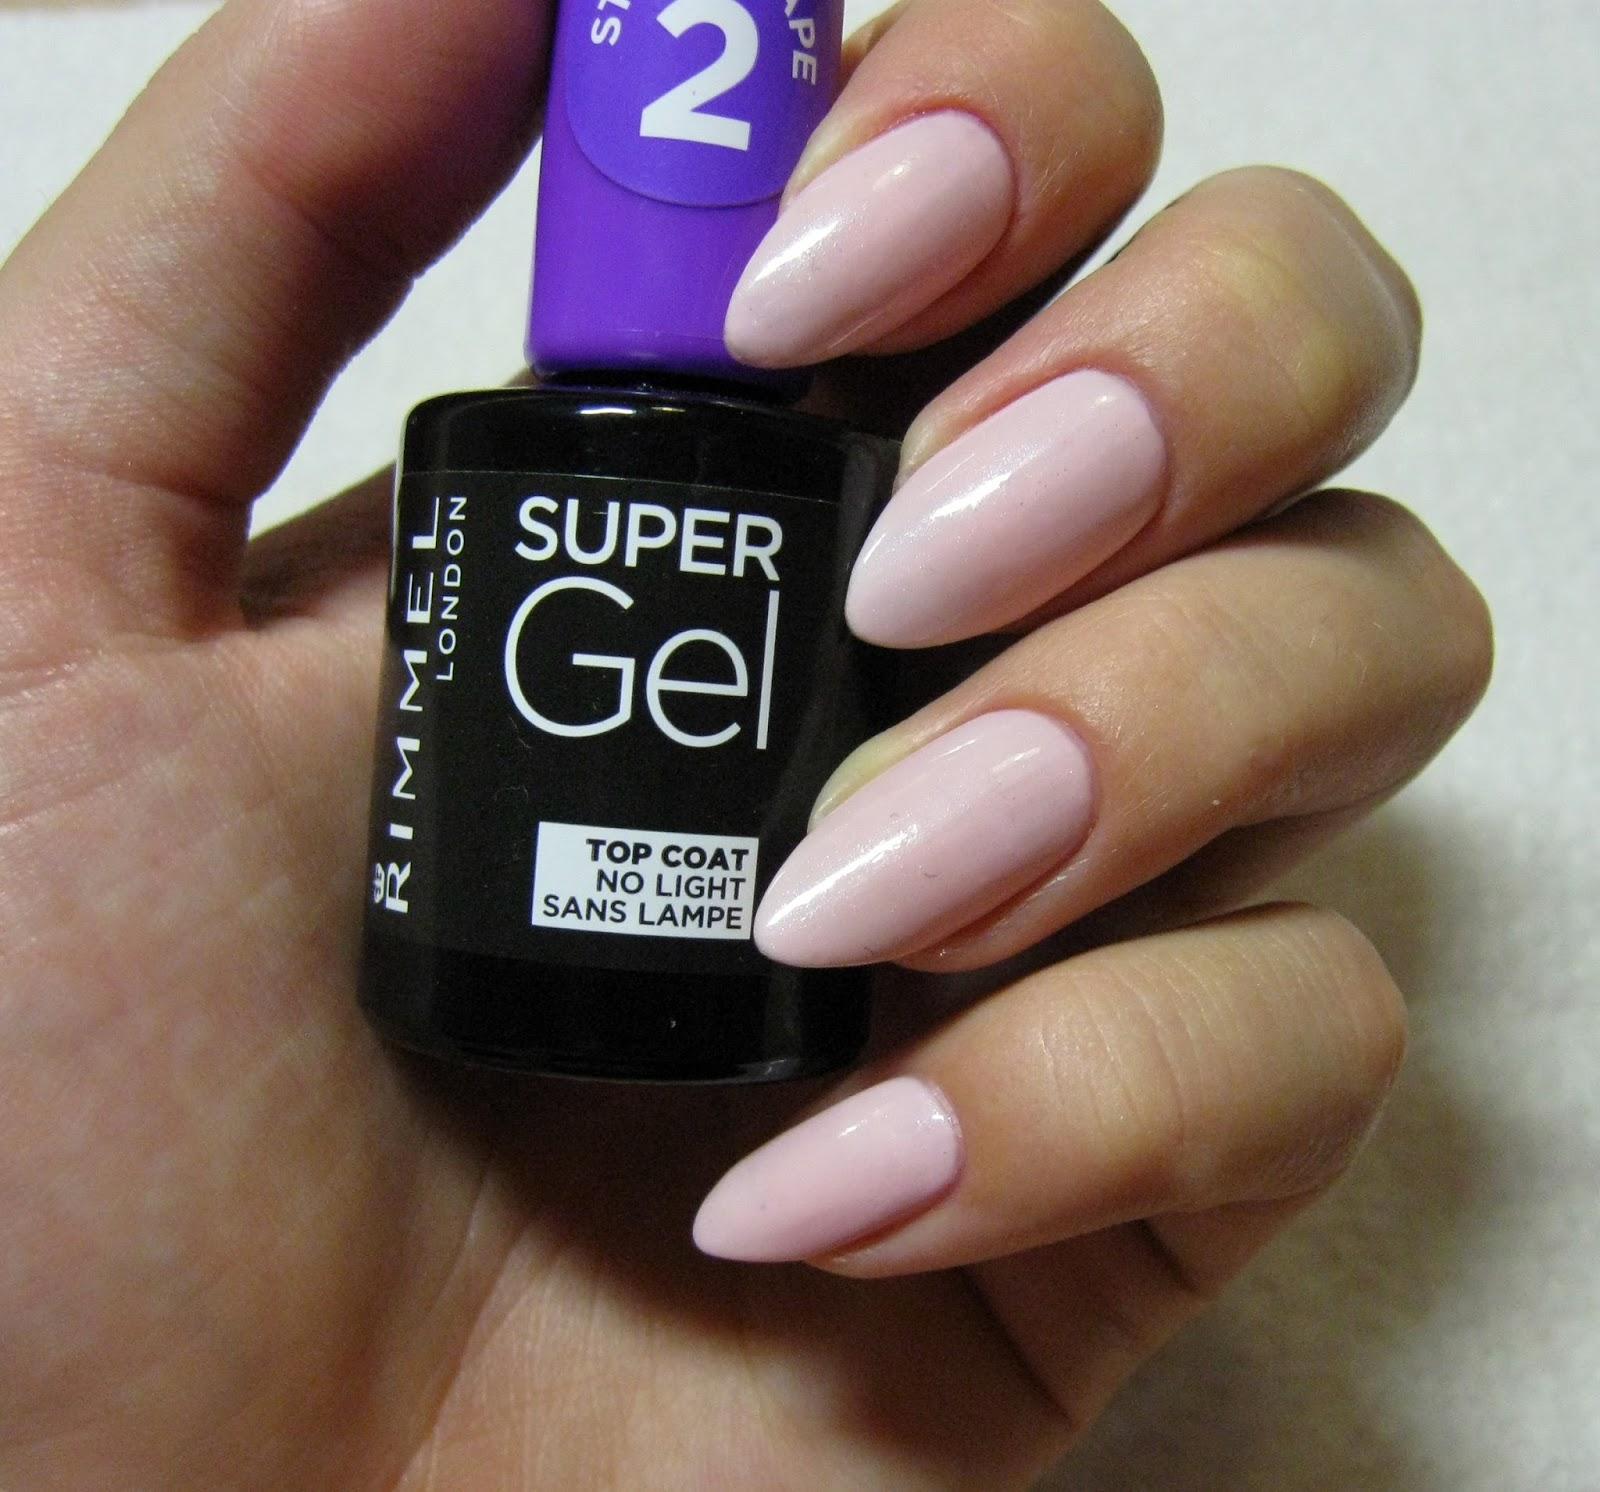 Www Wiolka94 Blogspot Com Rimmel Super Gel 021 New Romantic